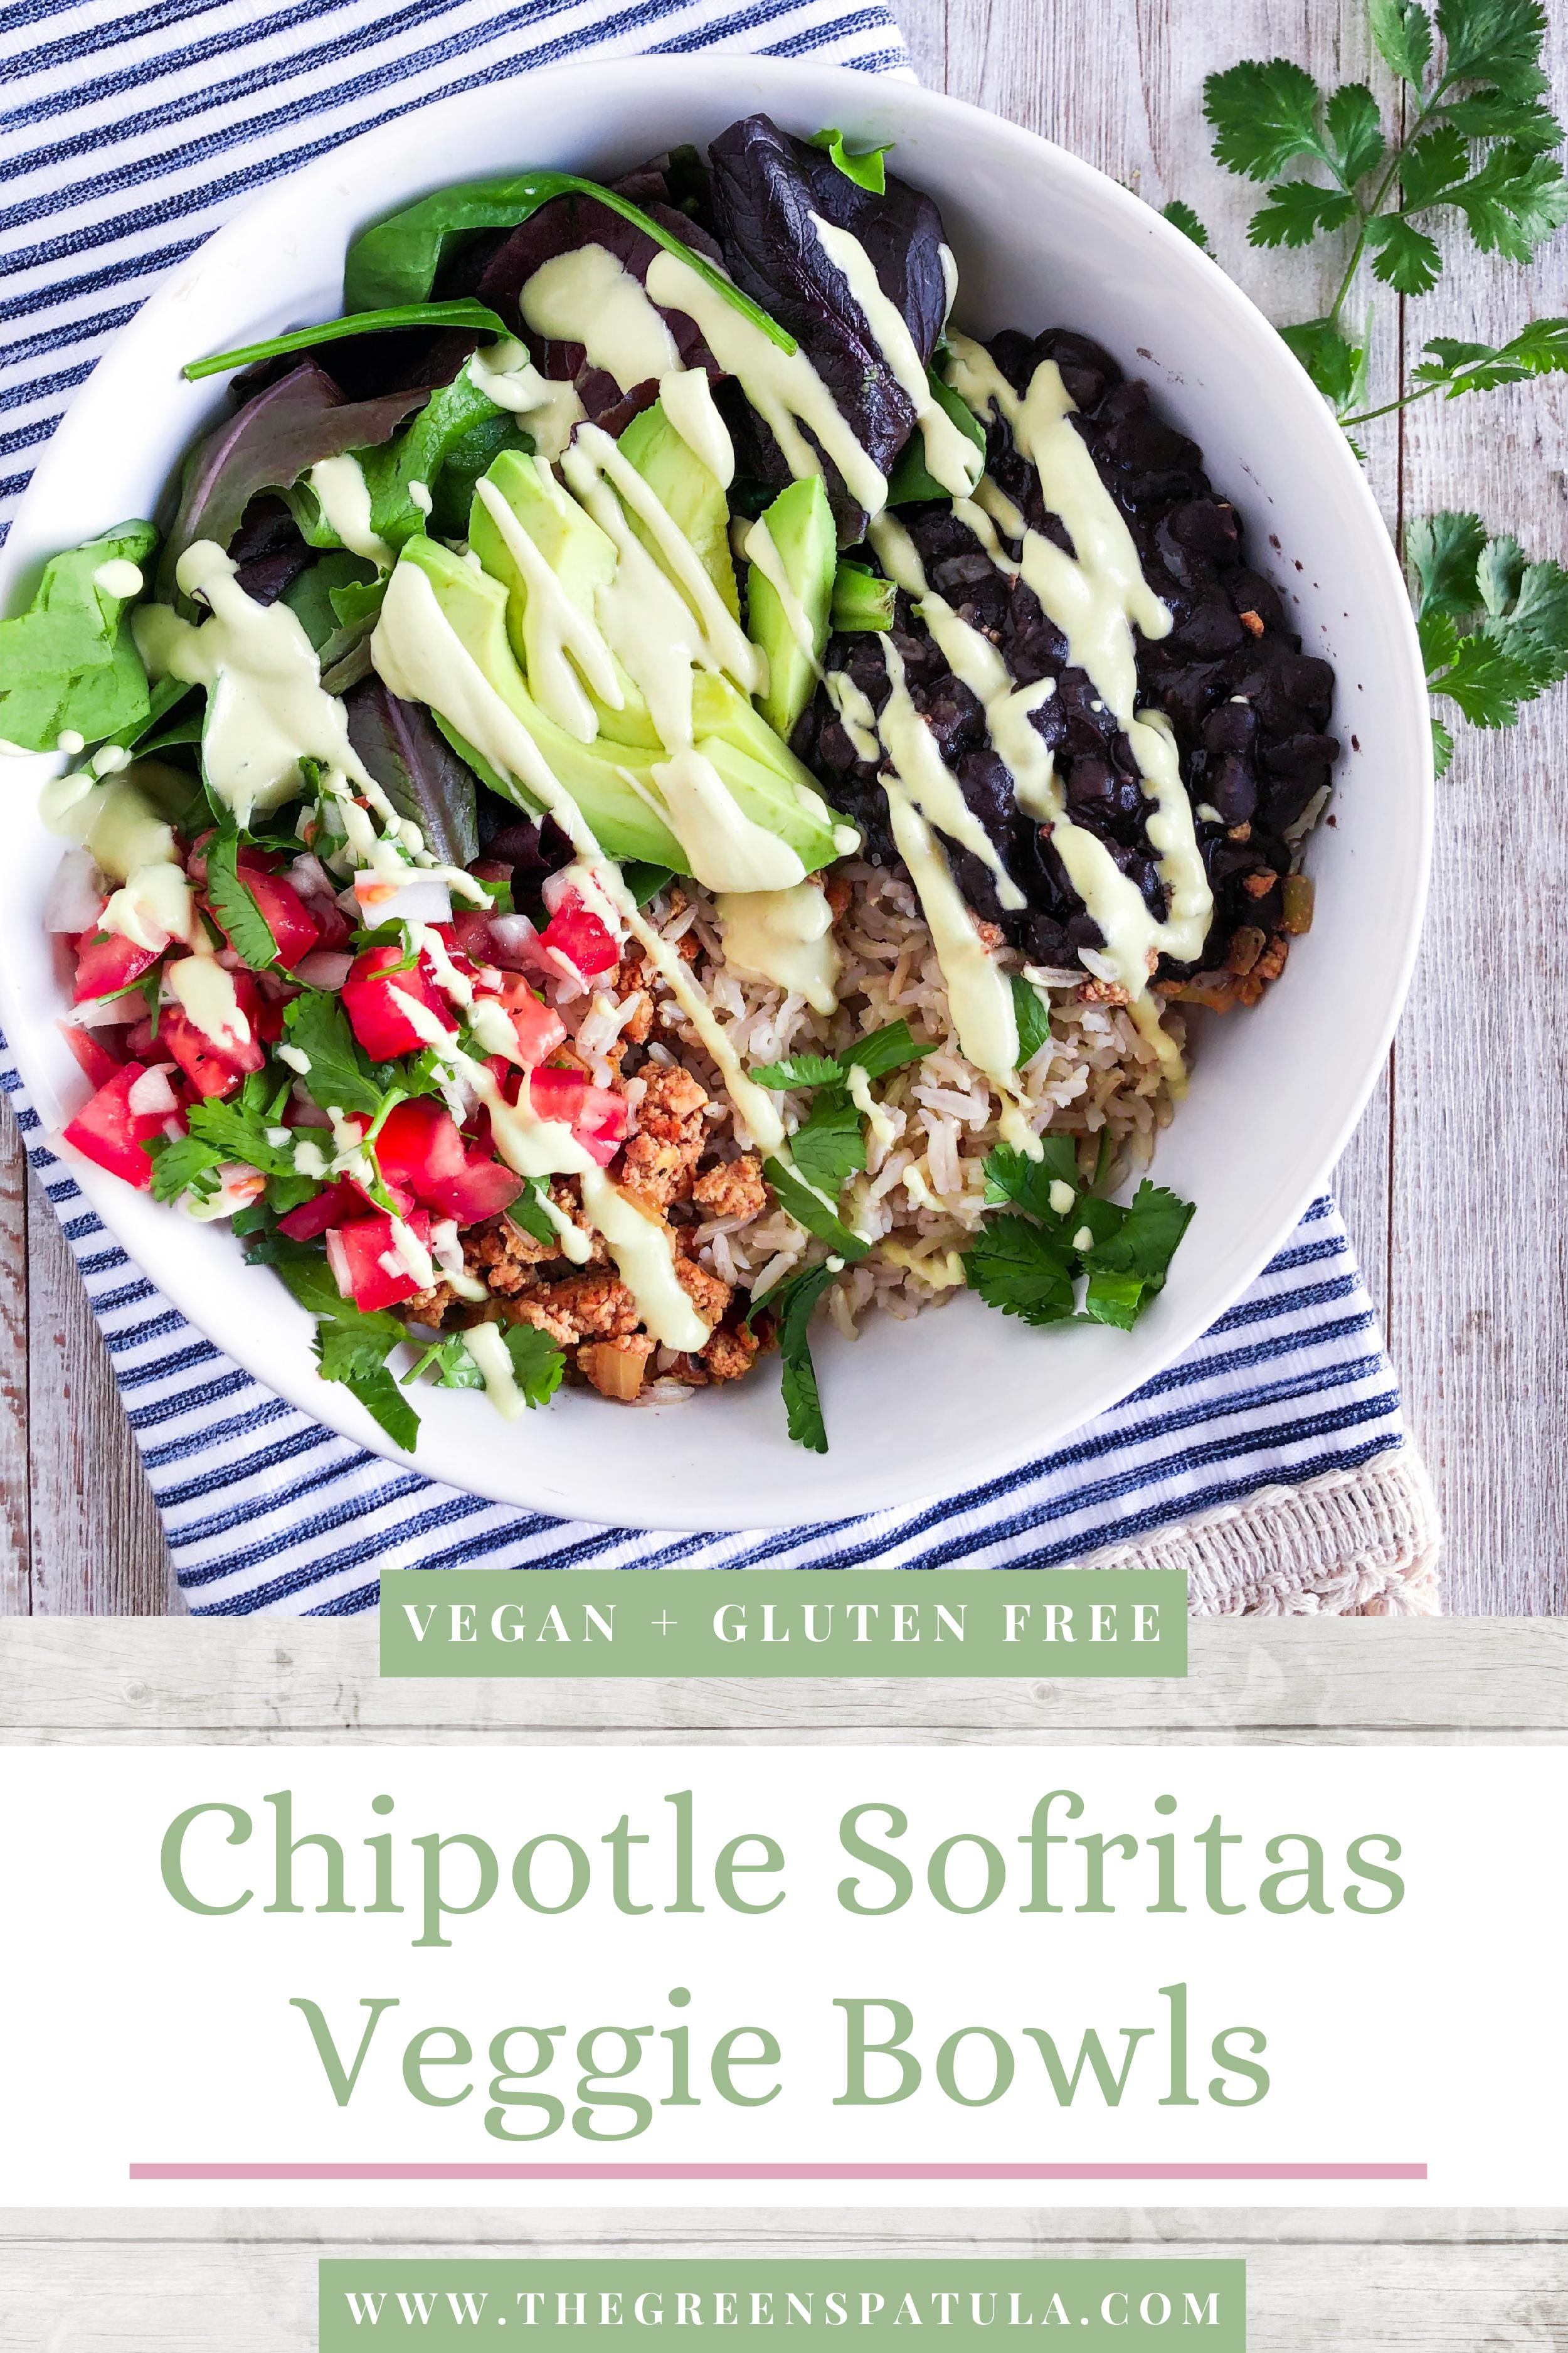 chipotle-sofritas-bowls-vegan-plant-based-healthy-meal-prep.jpg